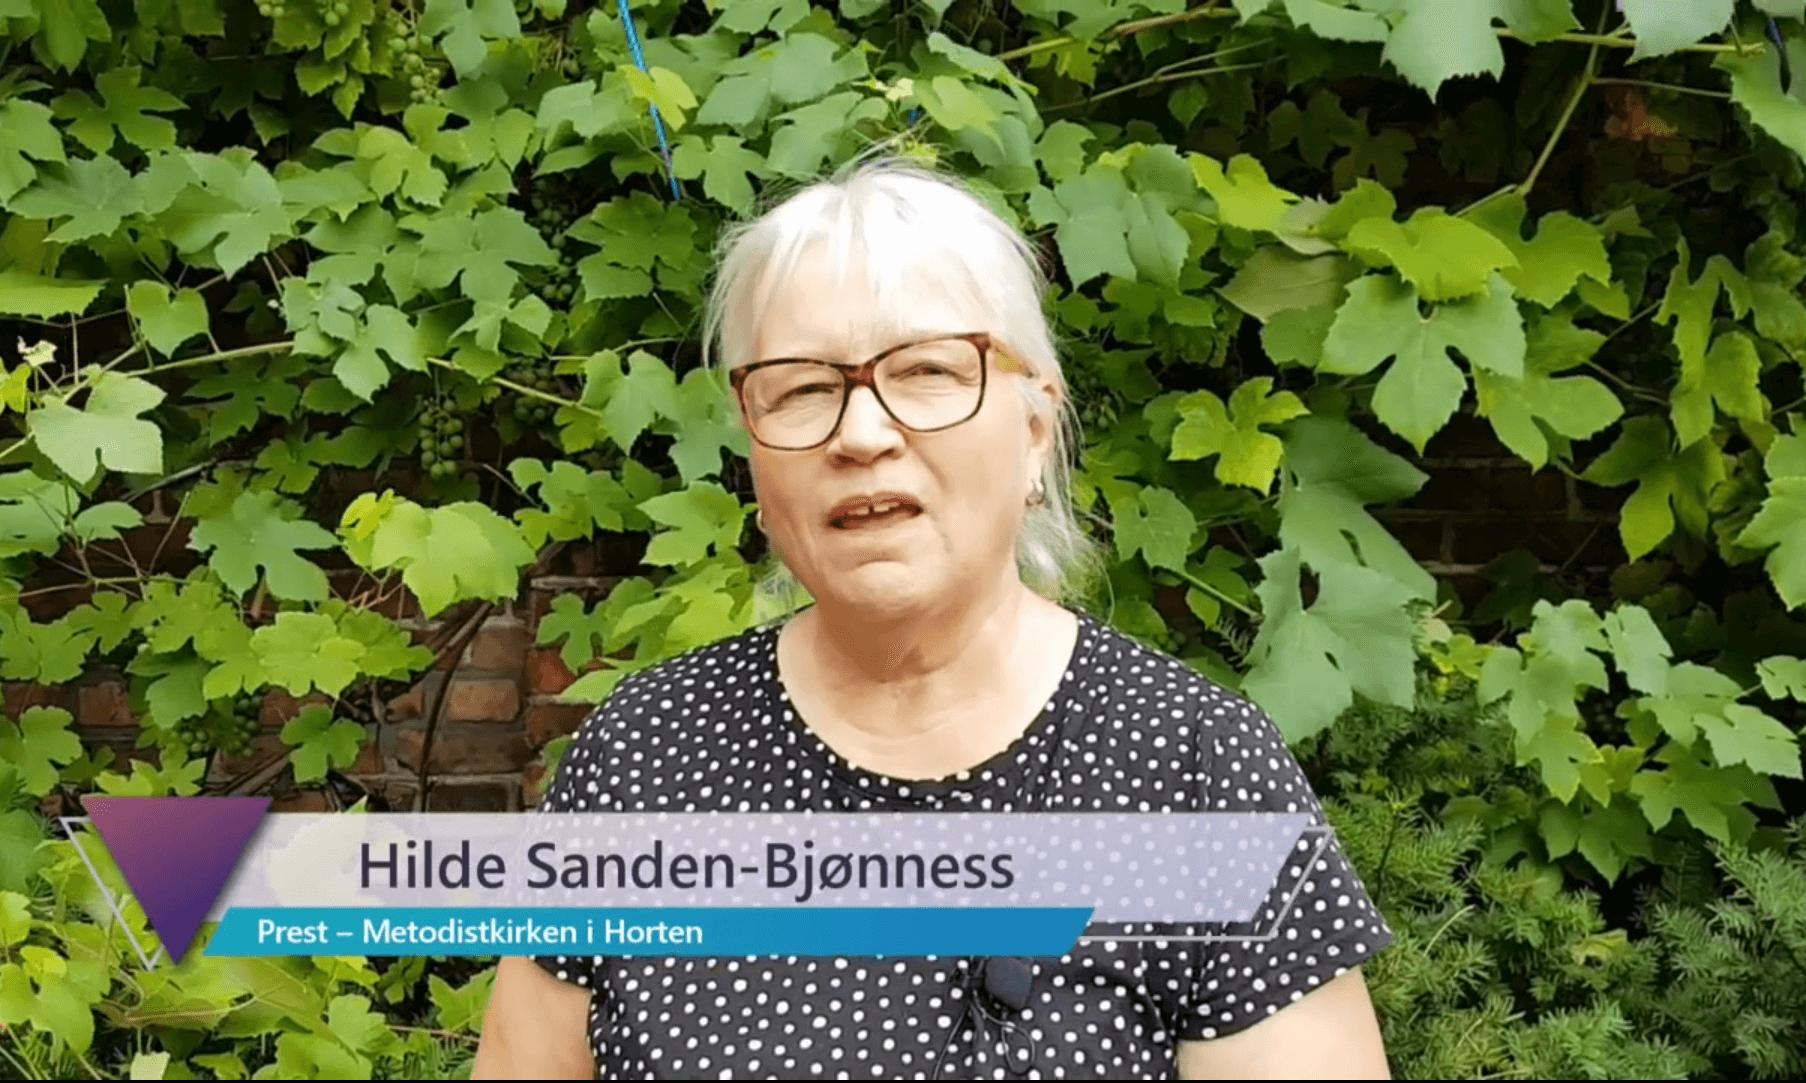 En video med Hilde Sanden-Bjønness